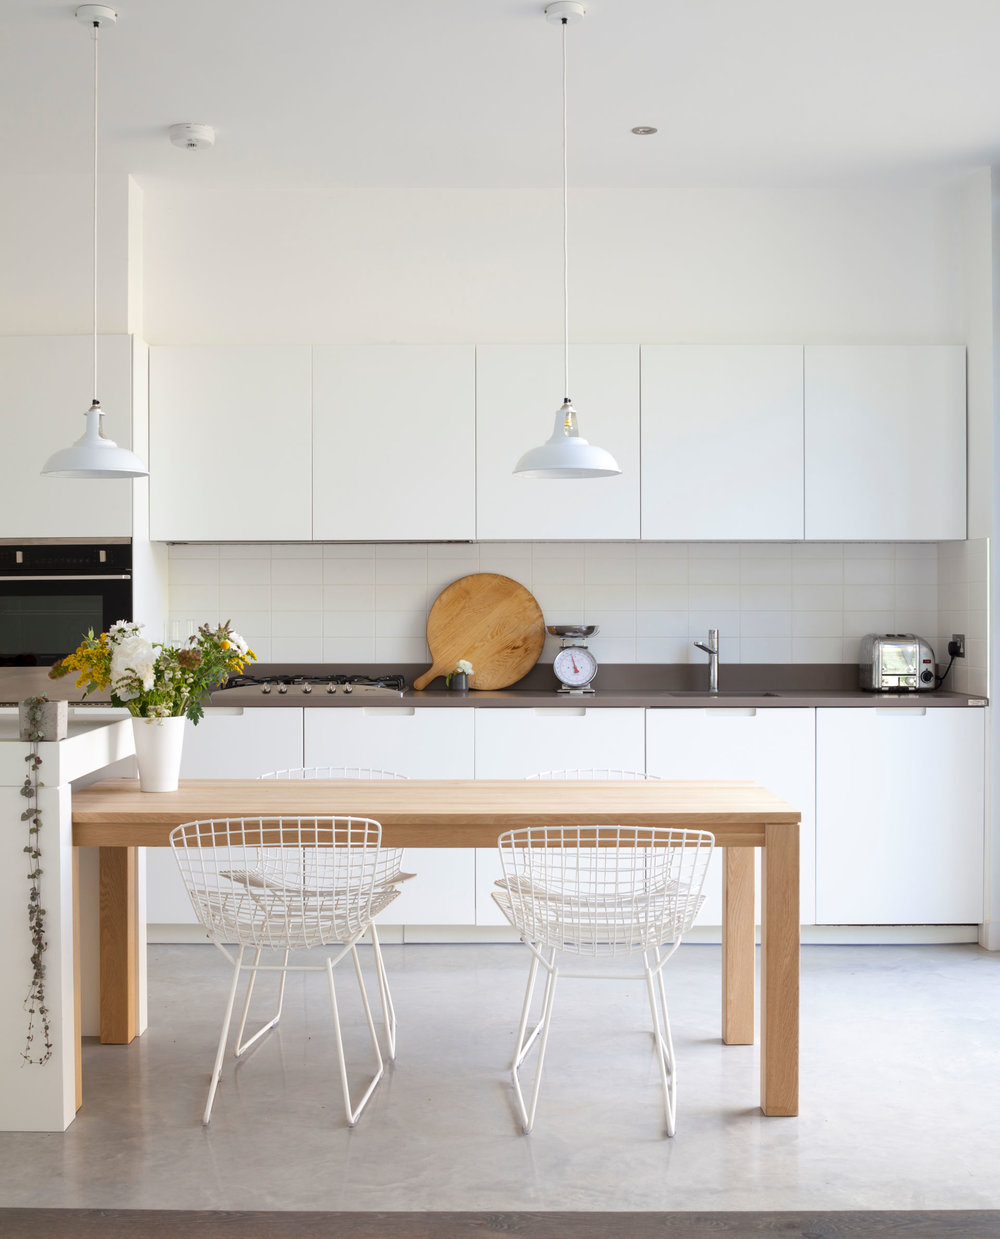 scenario-architecture-minimal-living-photography-matt-clayton-20.jpg